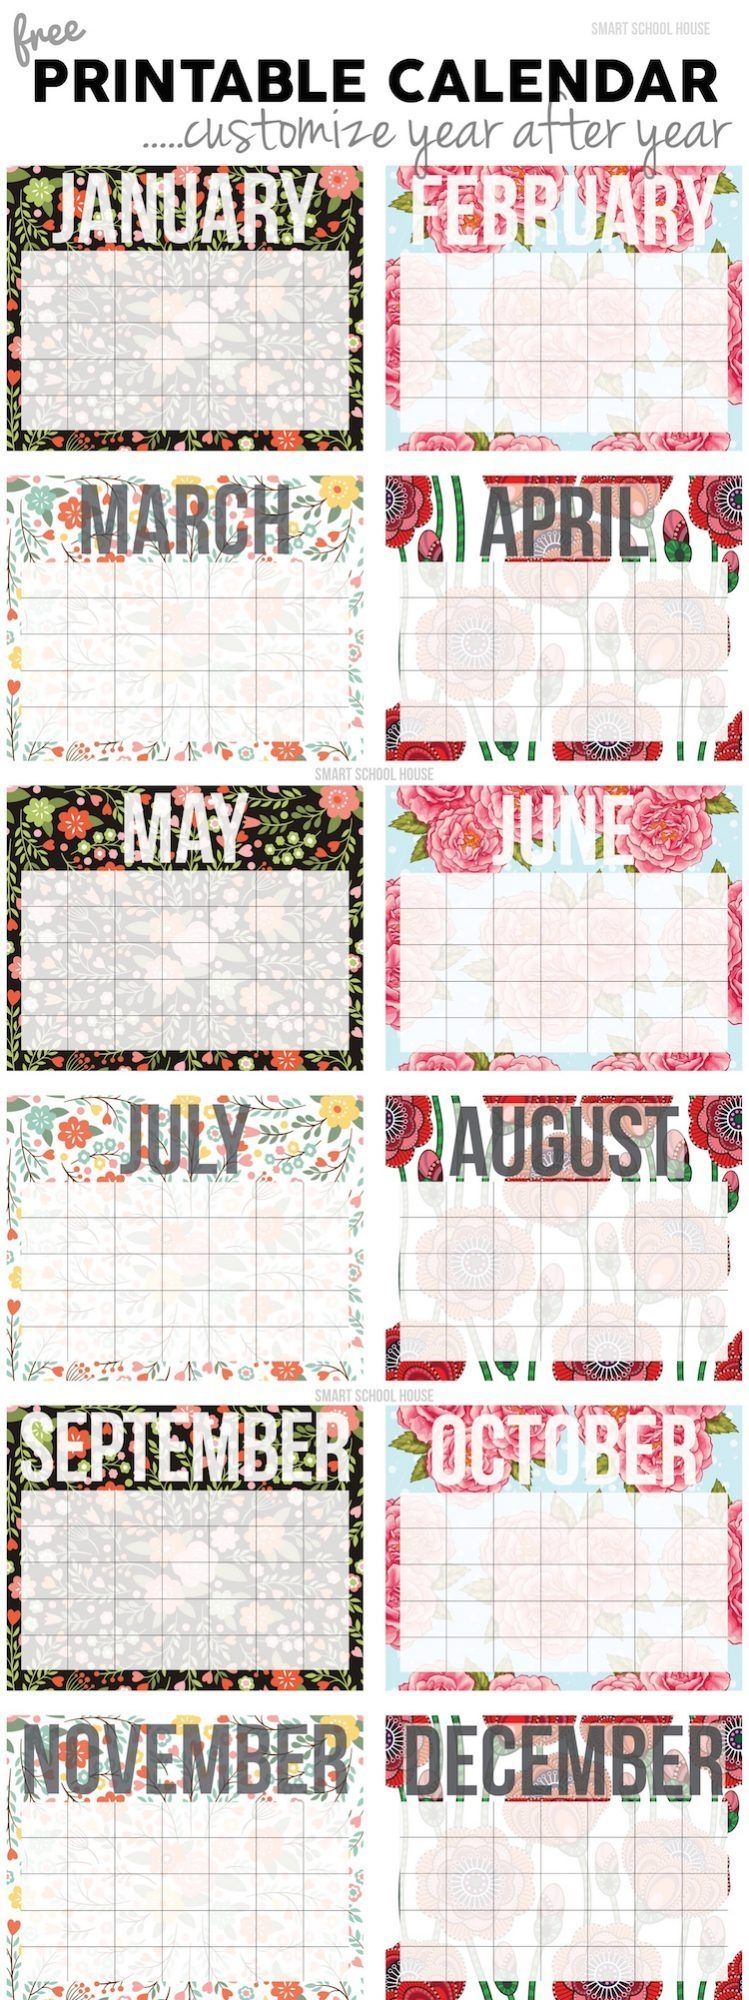 20 Free Printable Calendars For 2020 Yesmissy